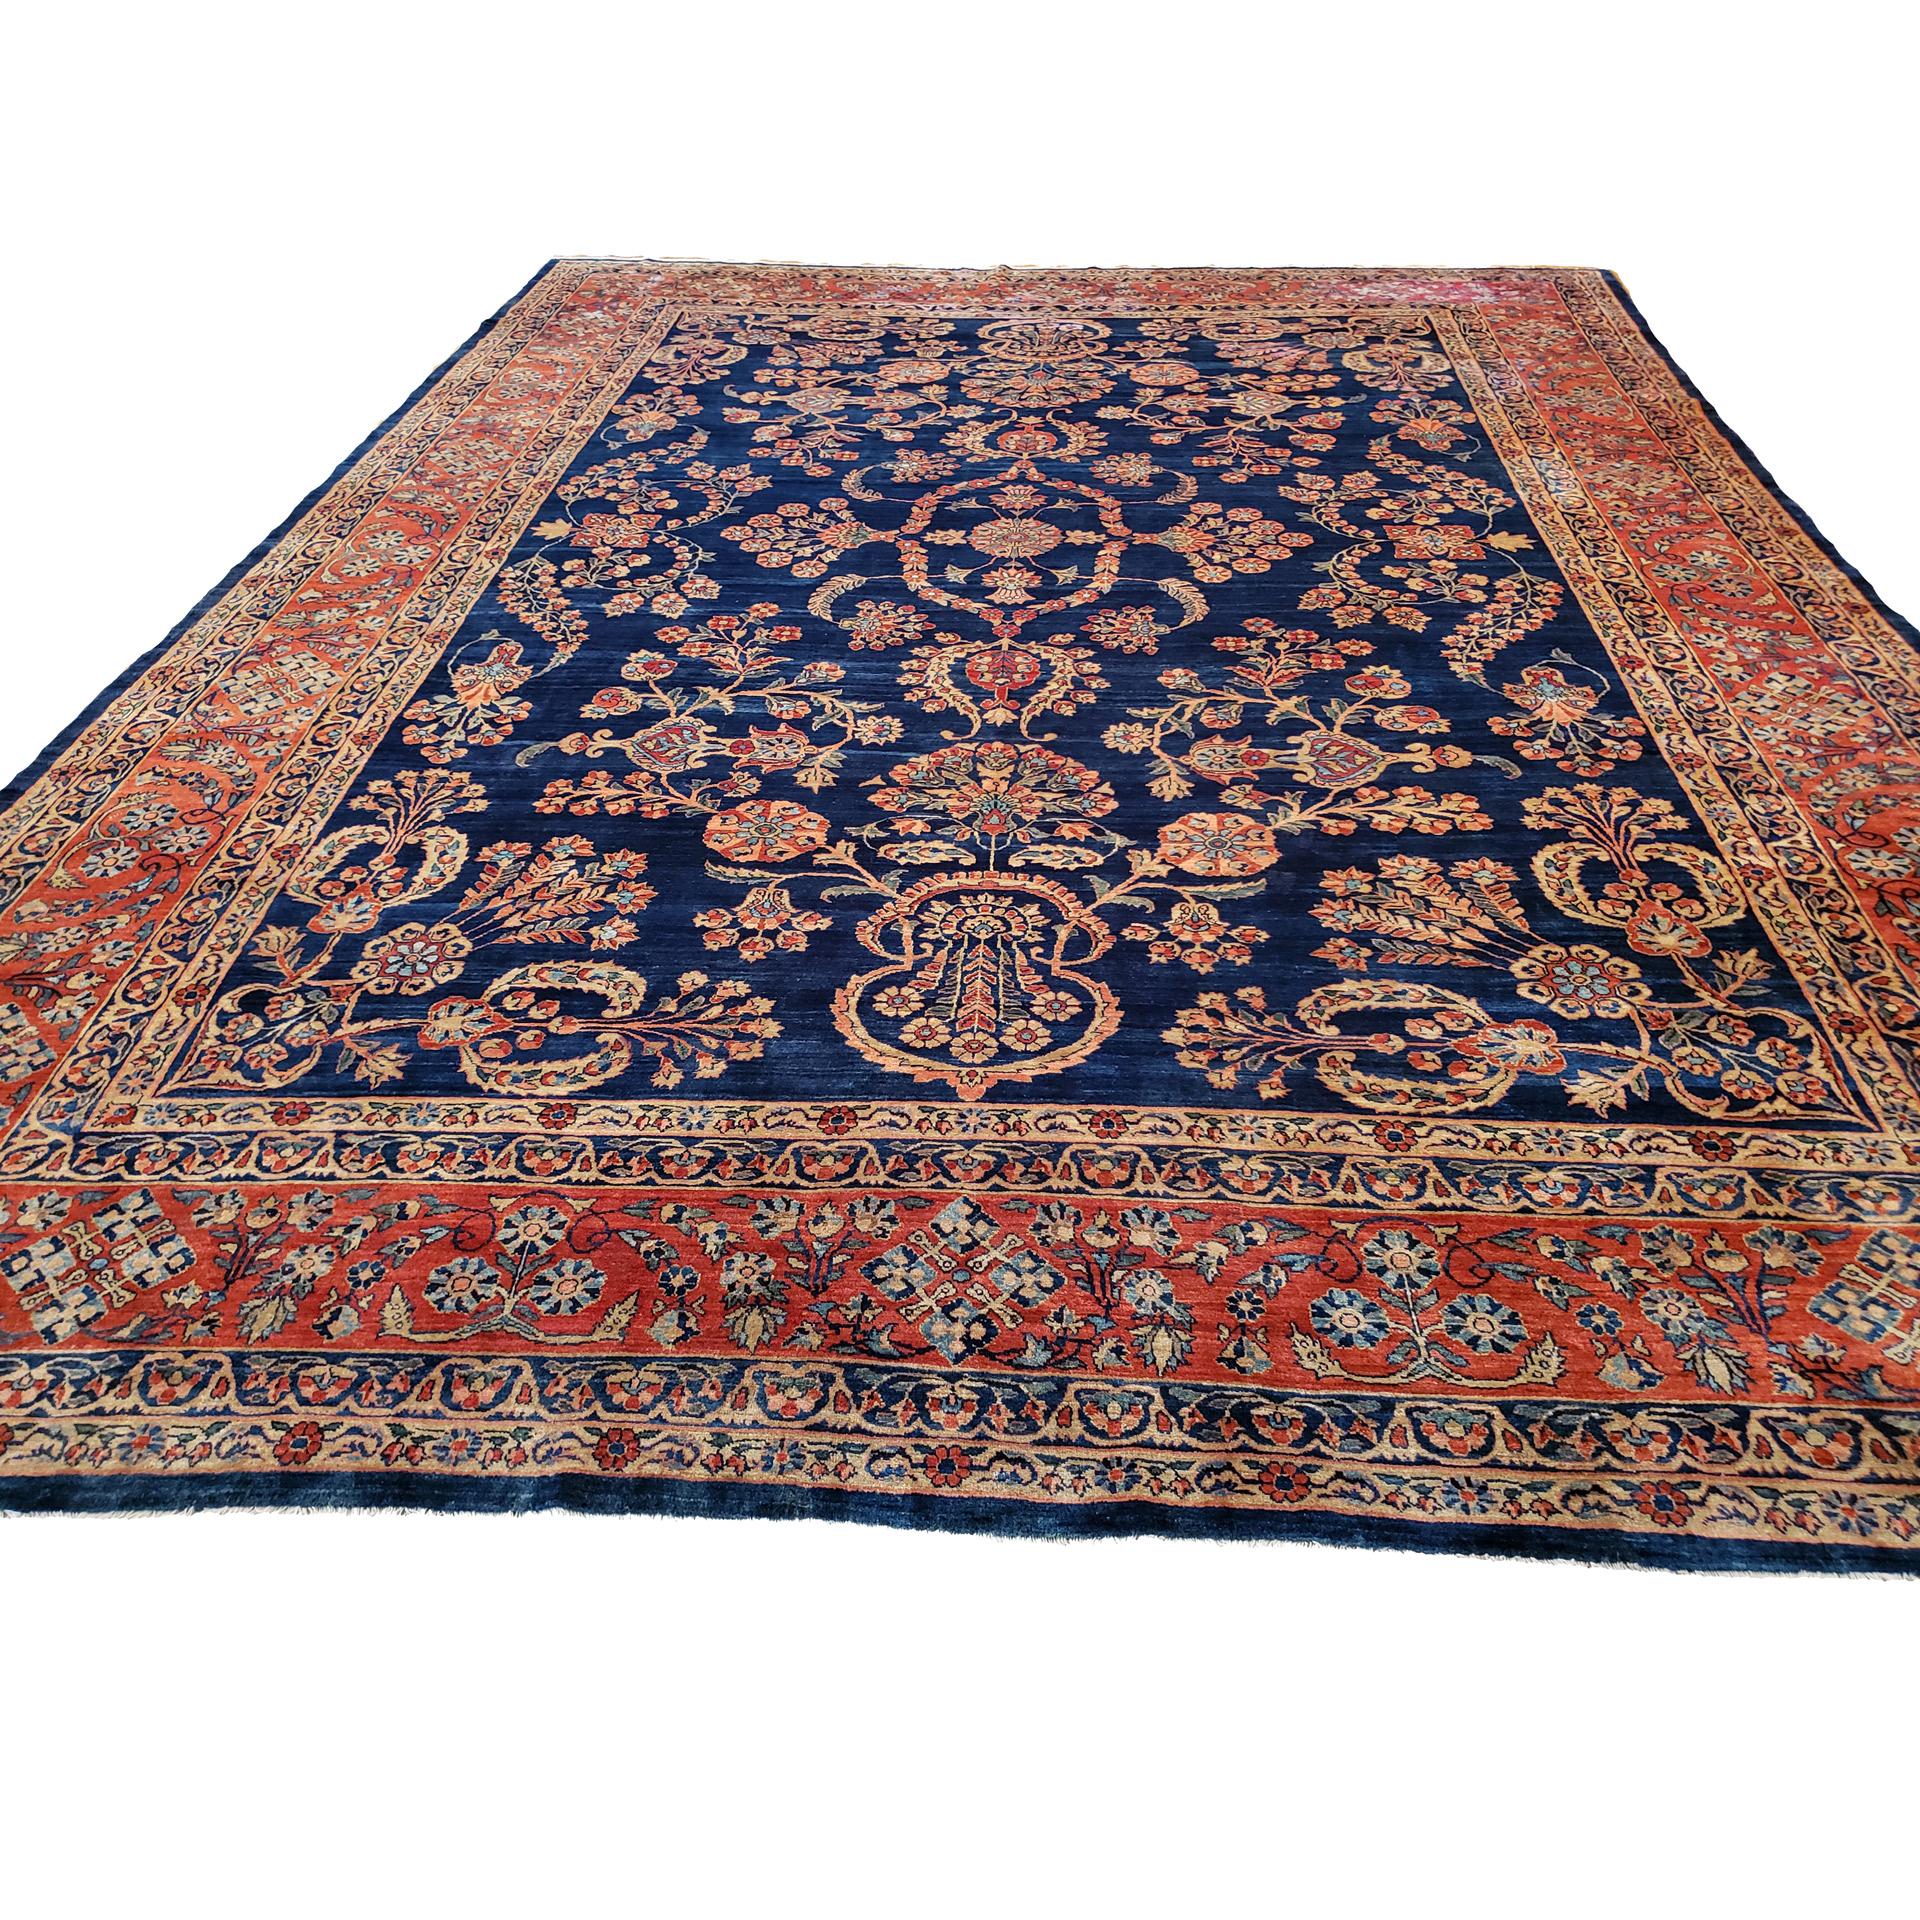 Antique Mahajaran Sarouk carpet with navy blue field, central Persian, circa 1915 - Douglas Stock Gallery, Boston,MA area